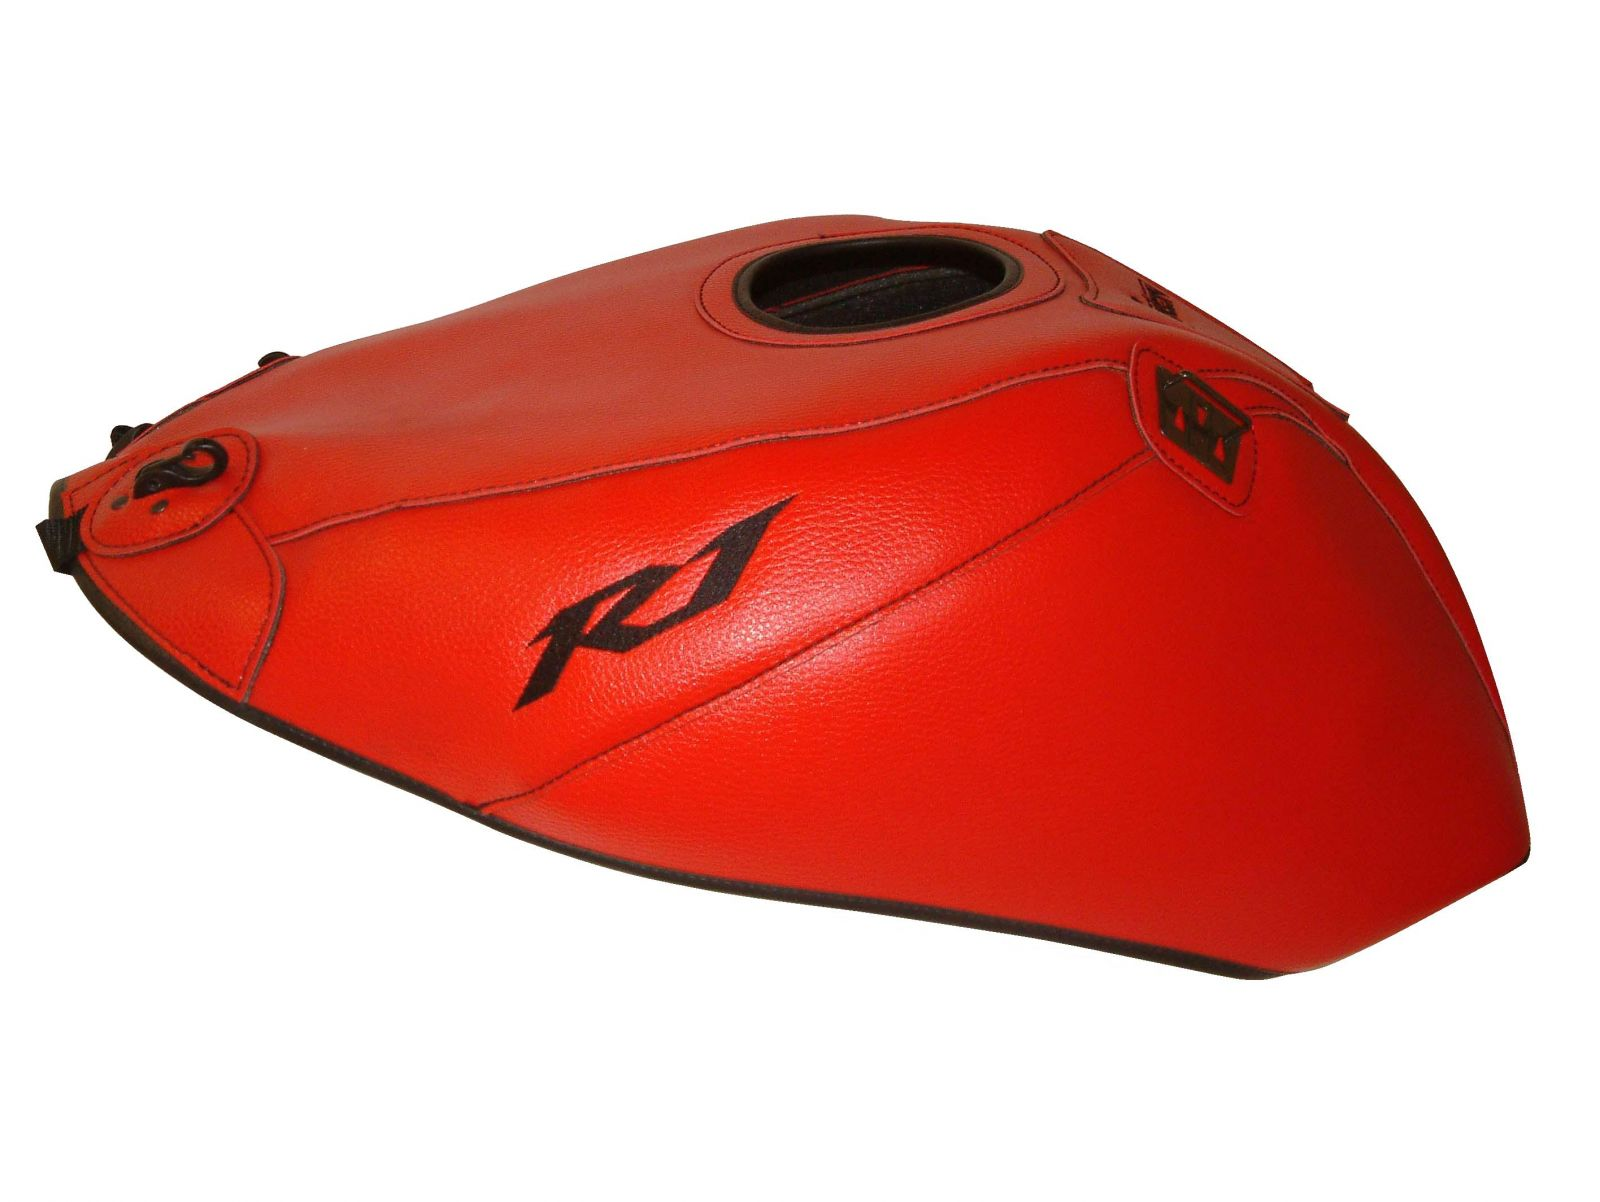 Capa de depósito TPR2007 - YAMAHA YZF R1 [2002-2003]